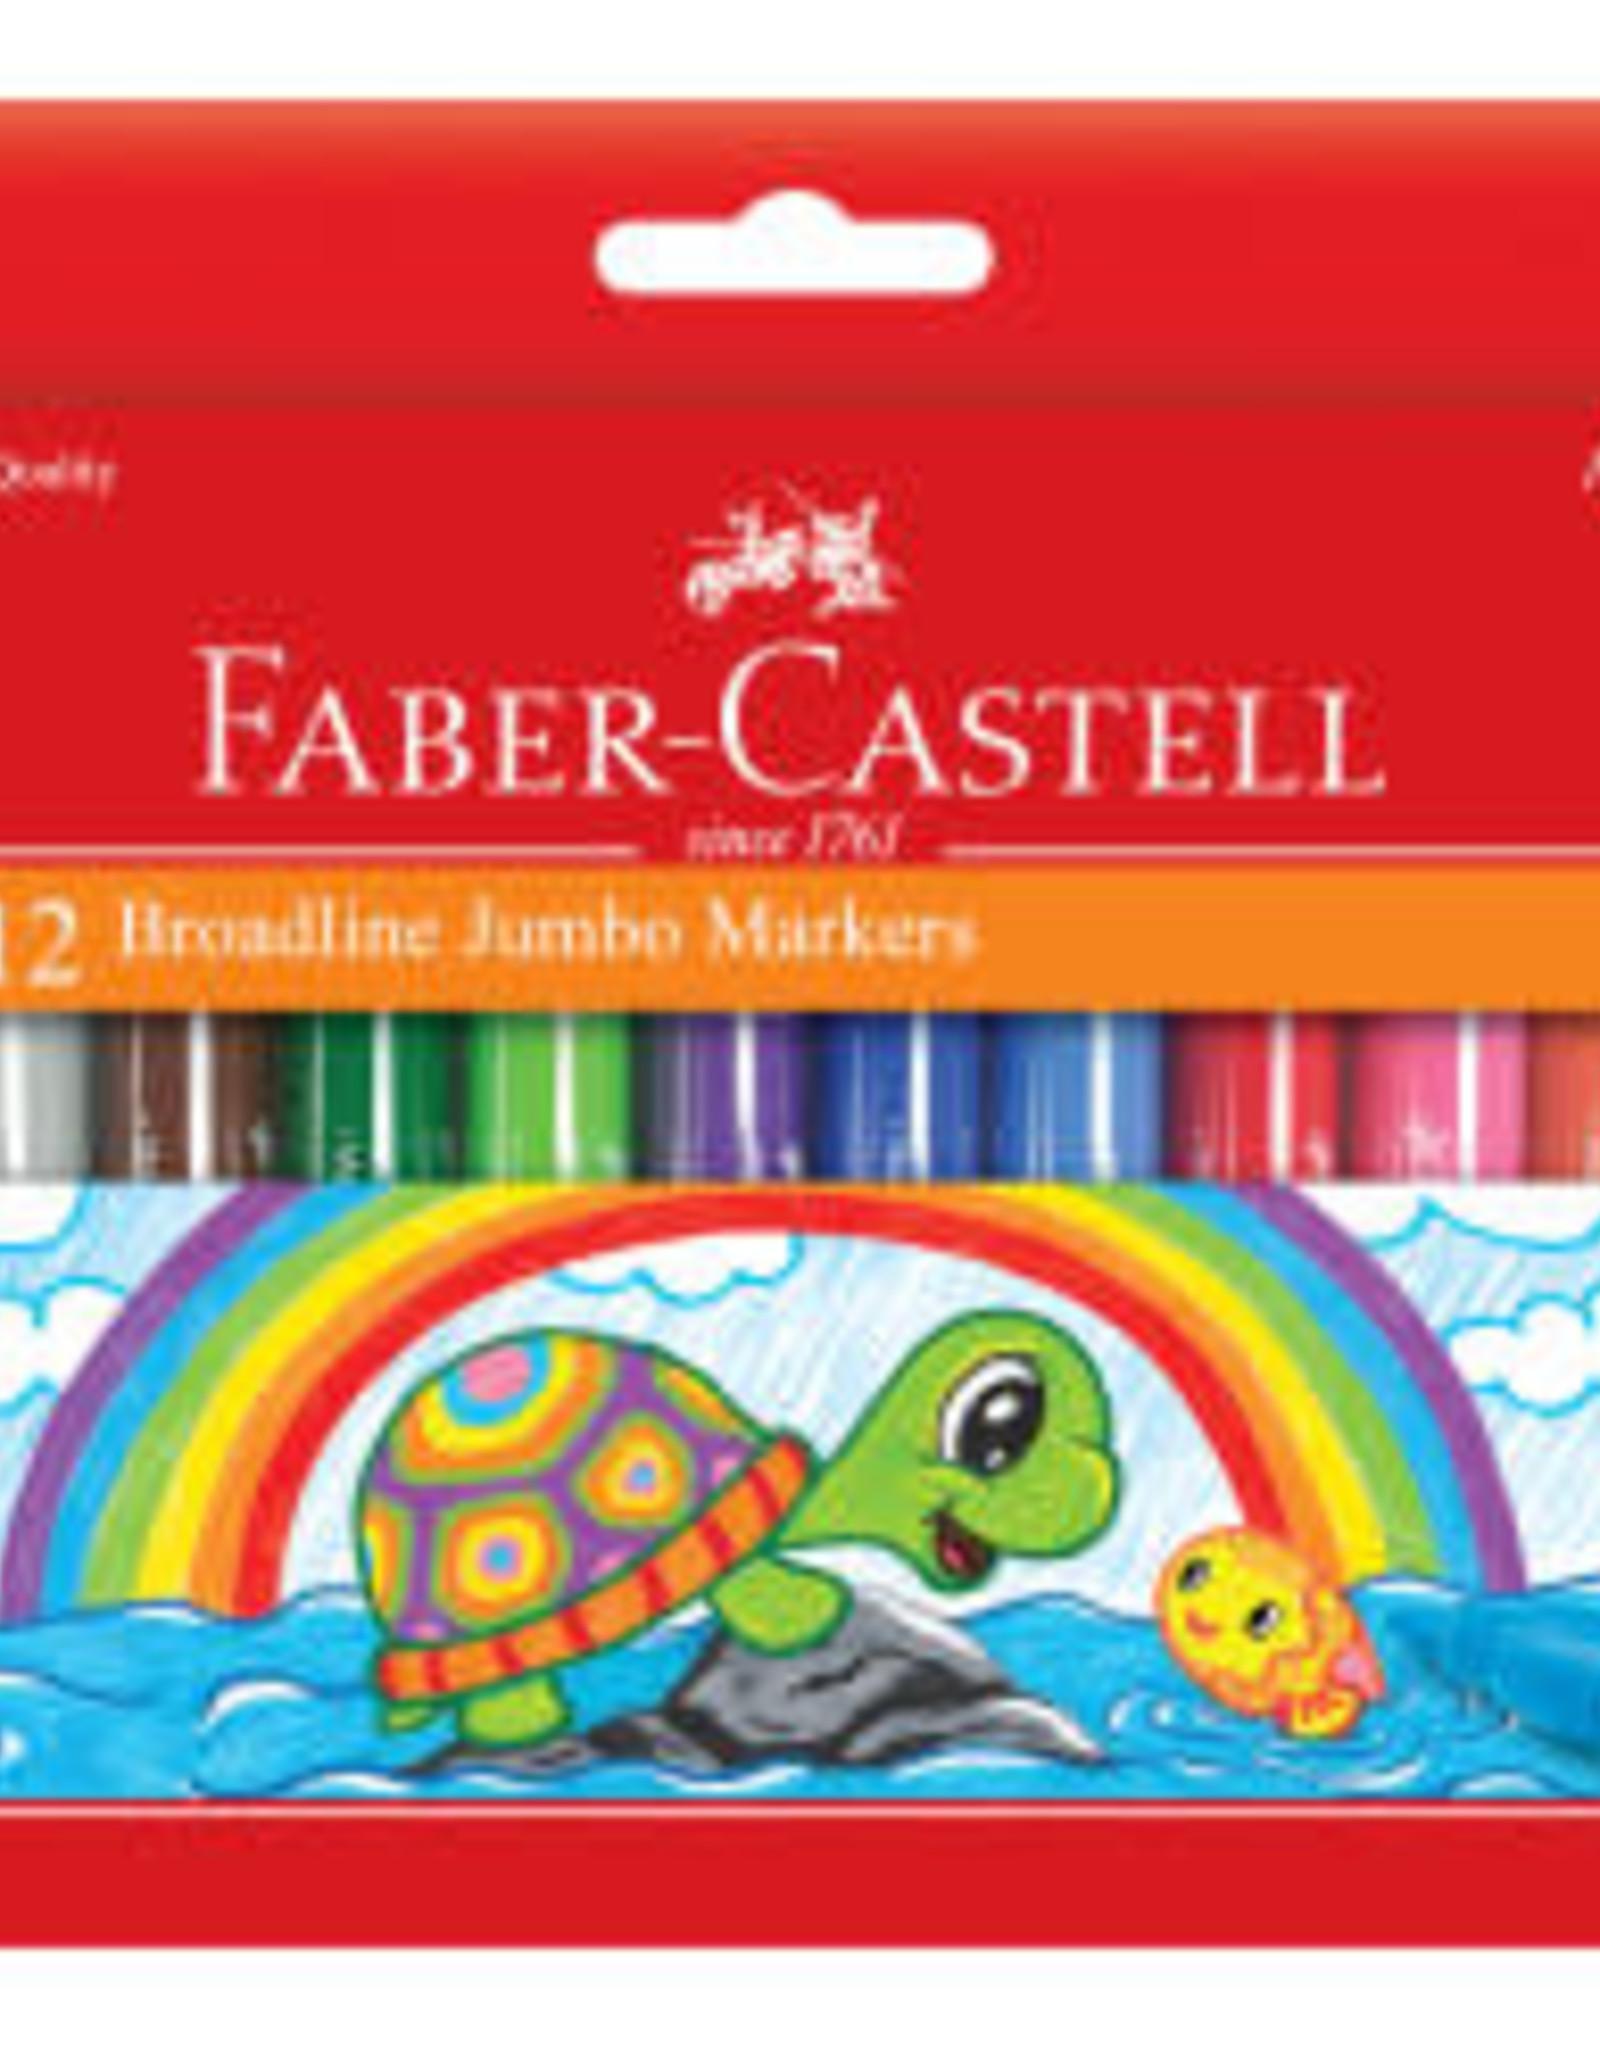 Faber-Castell 12ct Washable Broadline Jumbo Markers